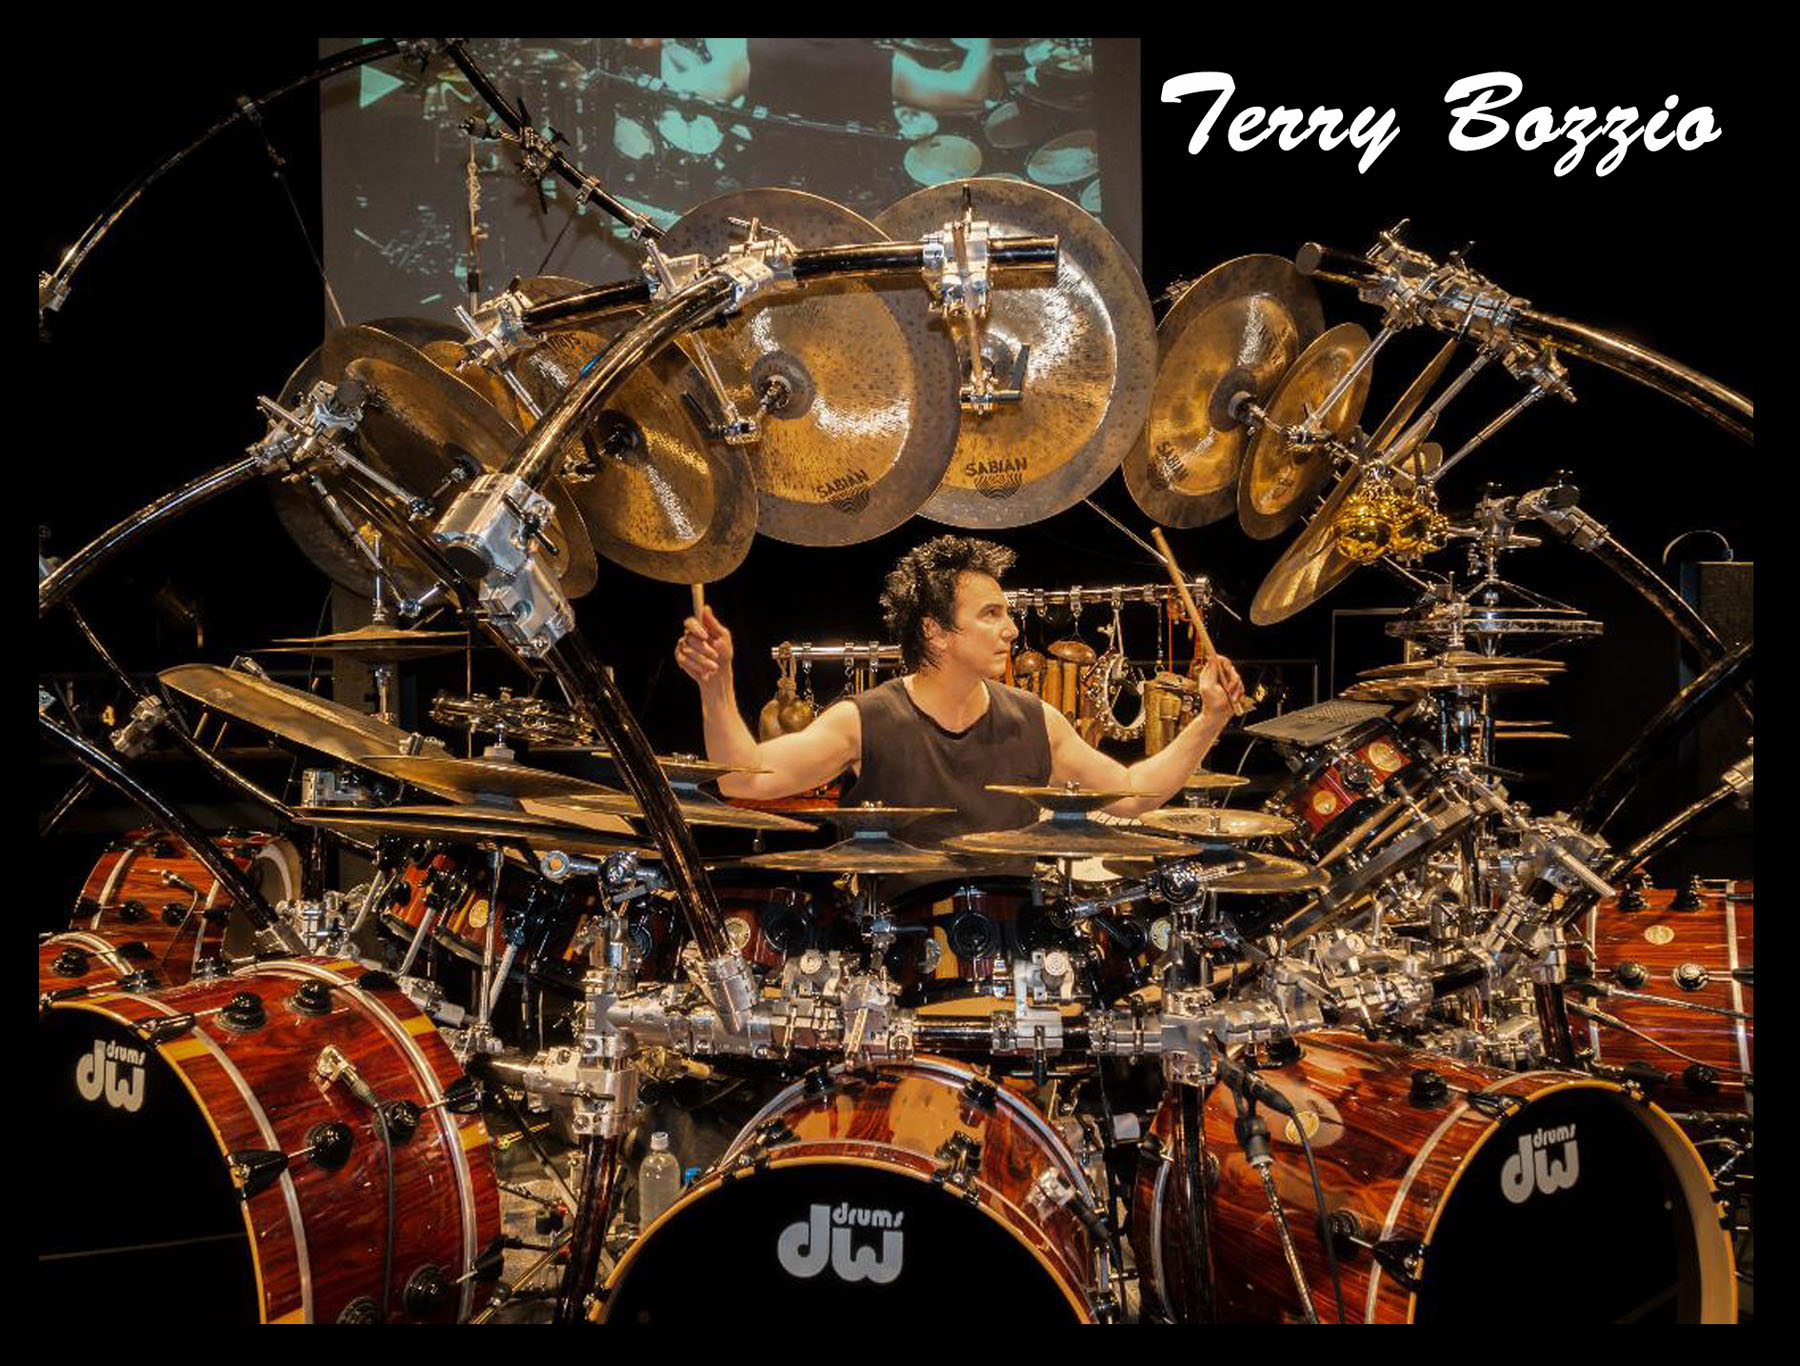 Terry-Bozzio-1.jpg